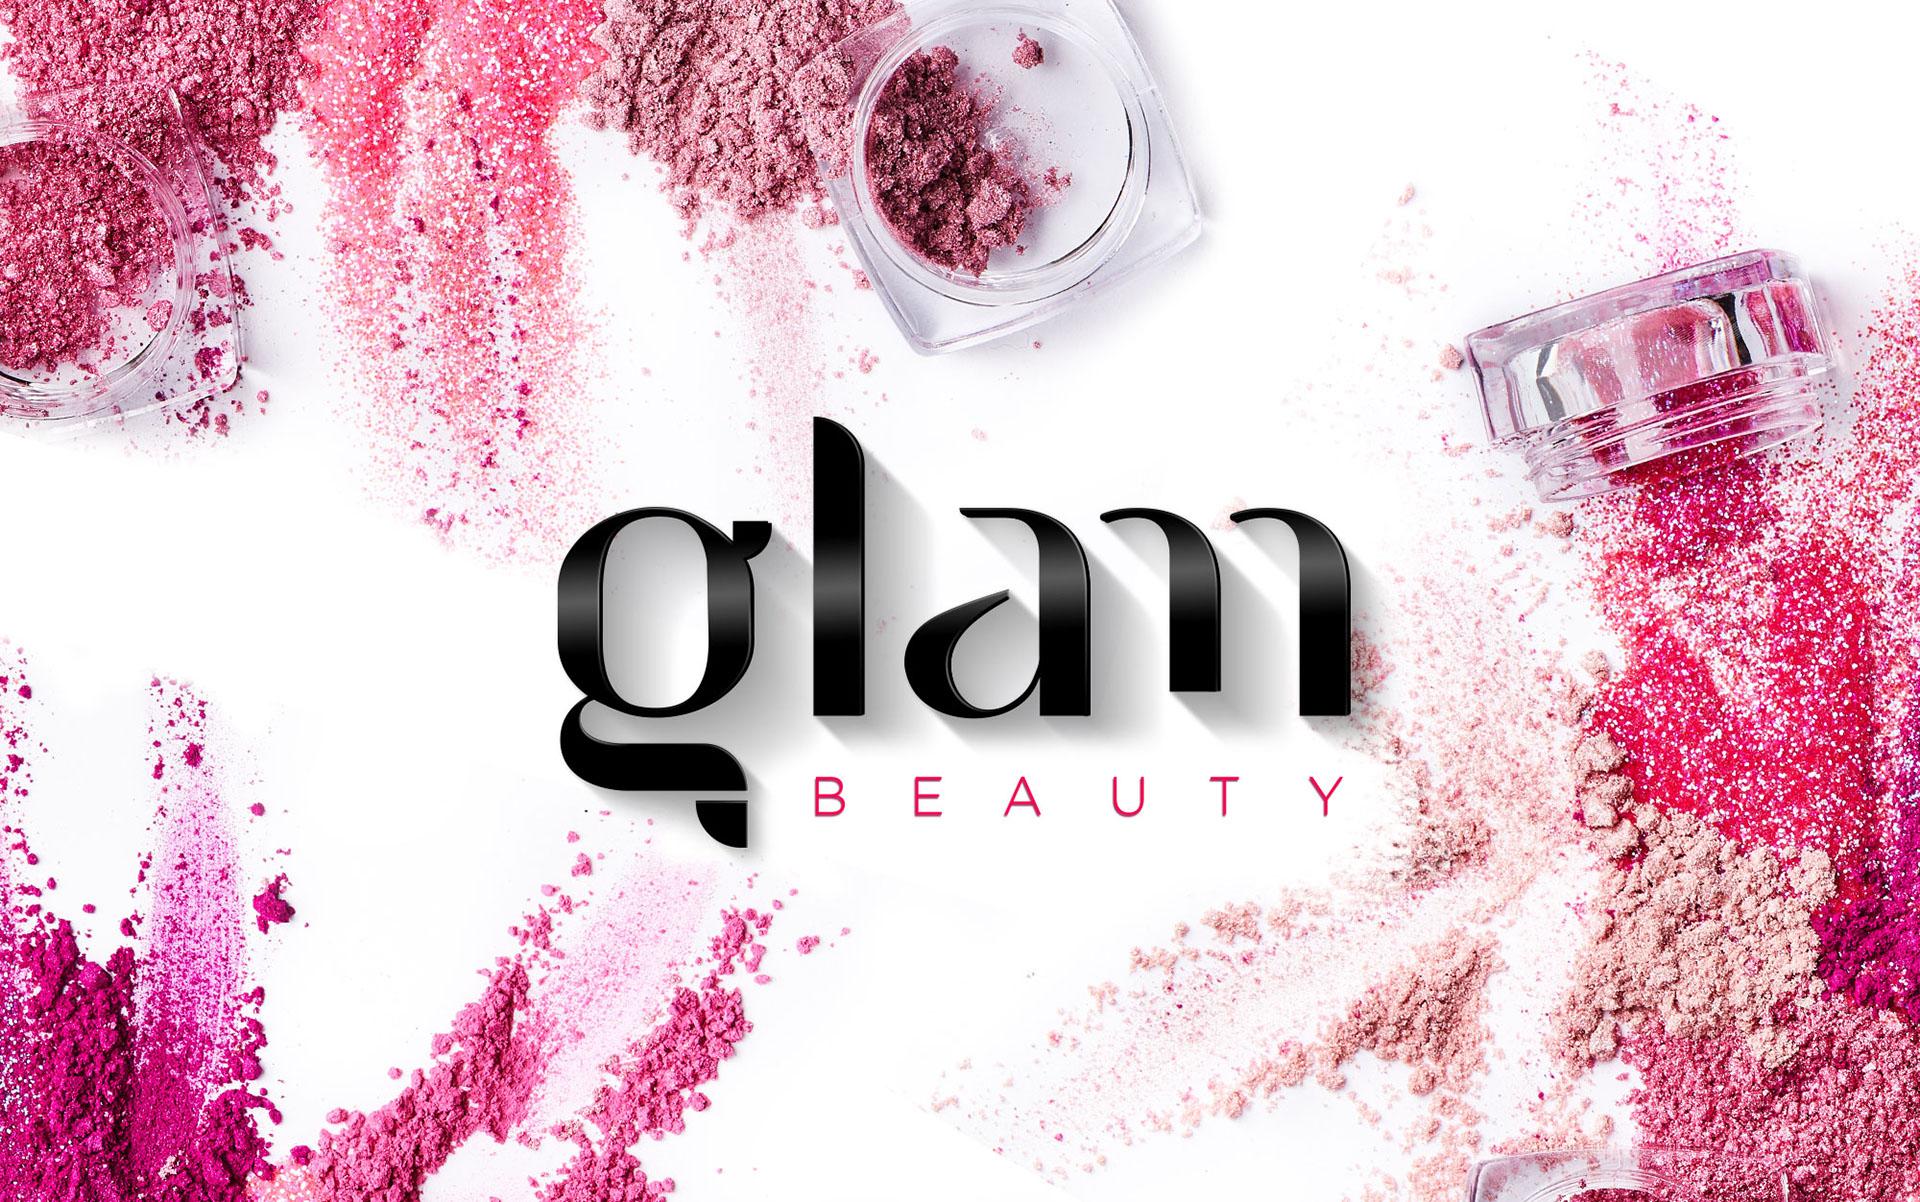 Glam Cosmetics Branding